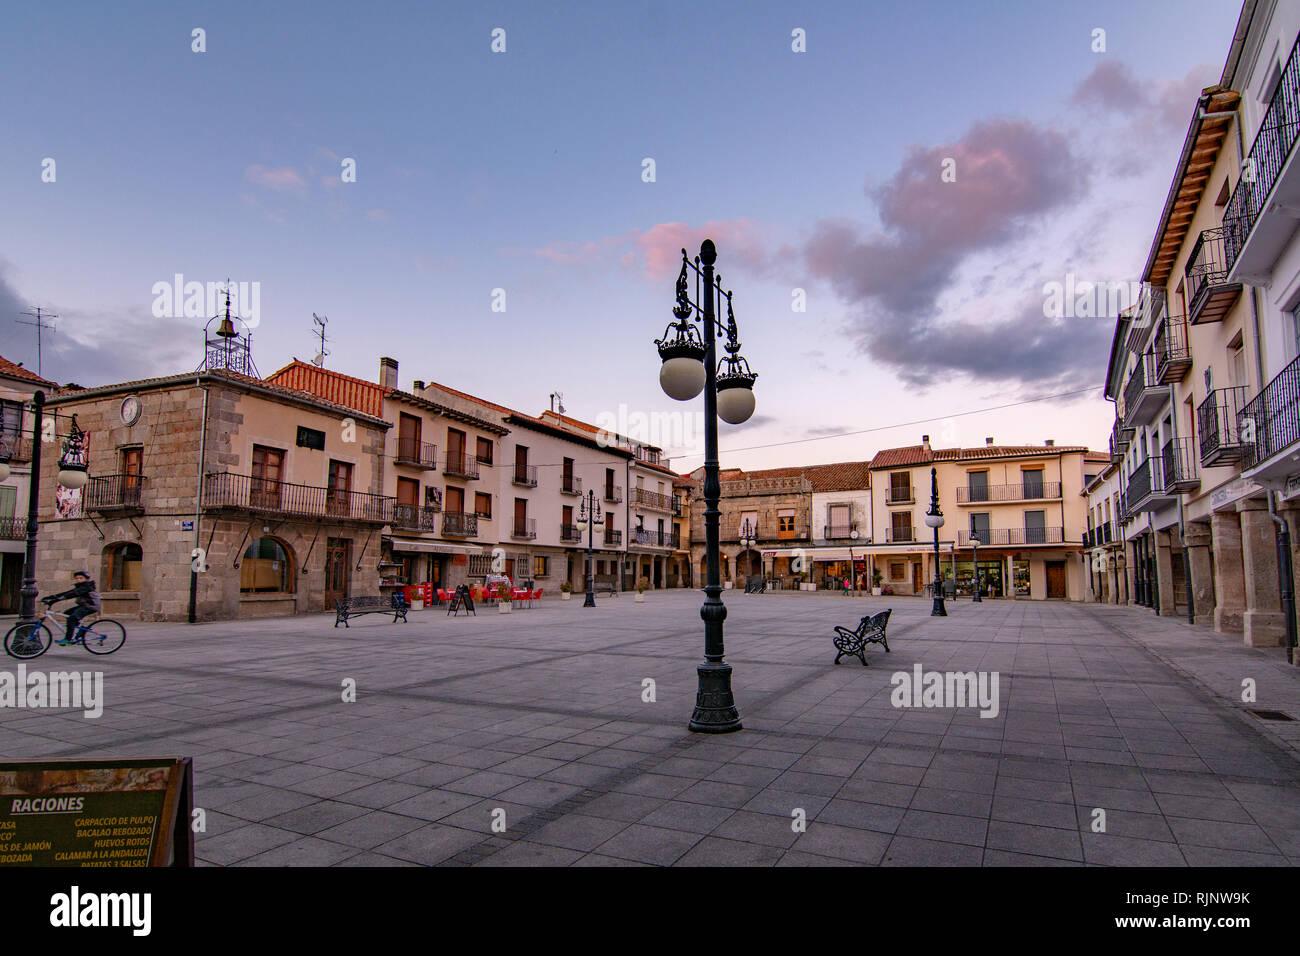 Barco de Avila, Avila, Spain, January 2017: view of the main square of the town of Barco de Avila Stock Photo